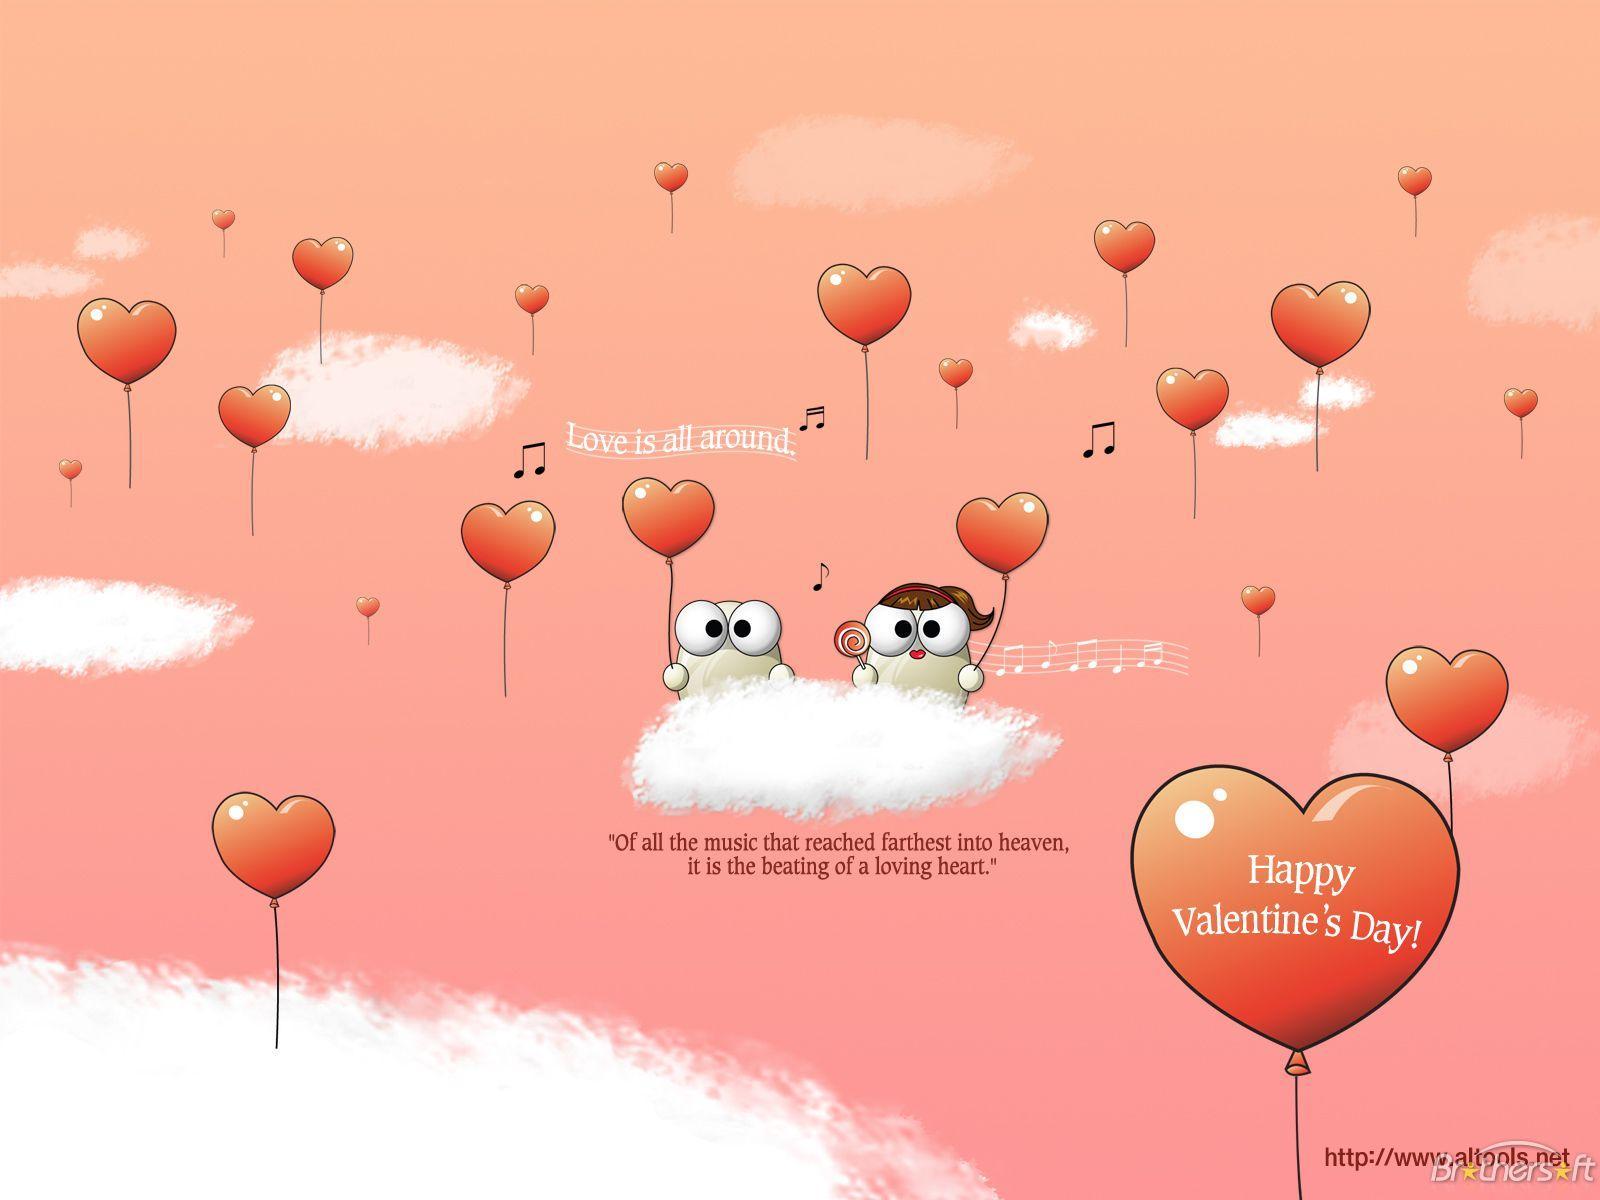 1600x1200 Download Free ALTools St. Valentines Day Wallpaper, ALTools St